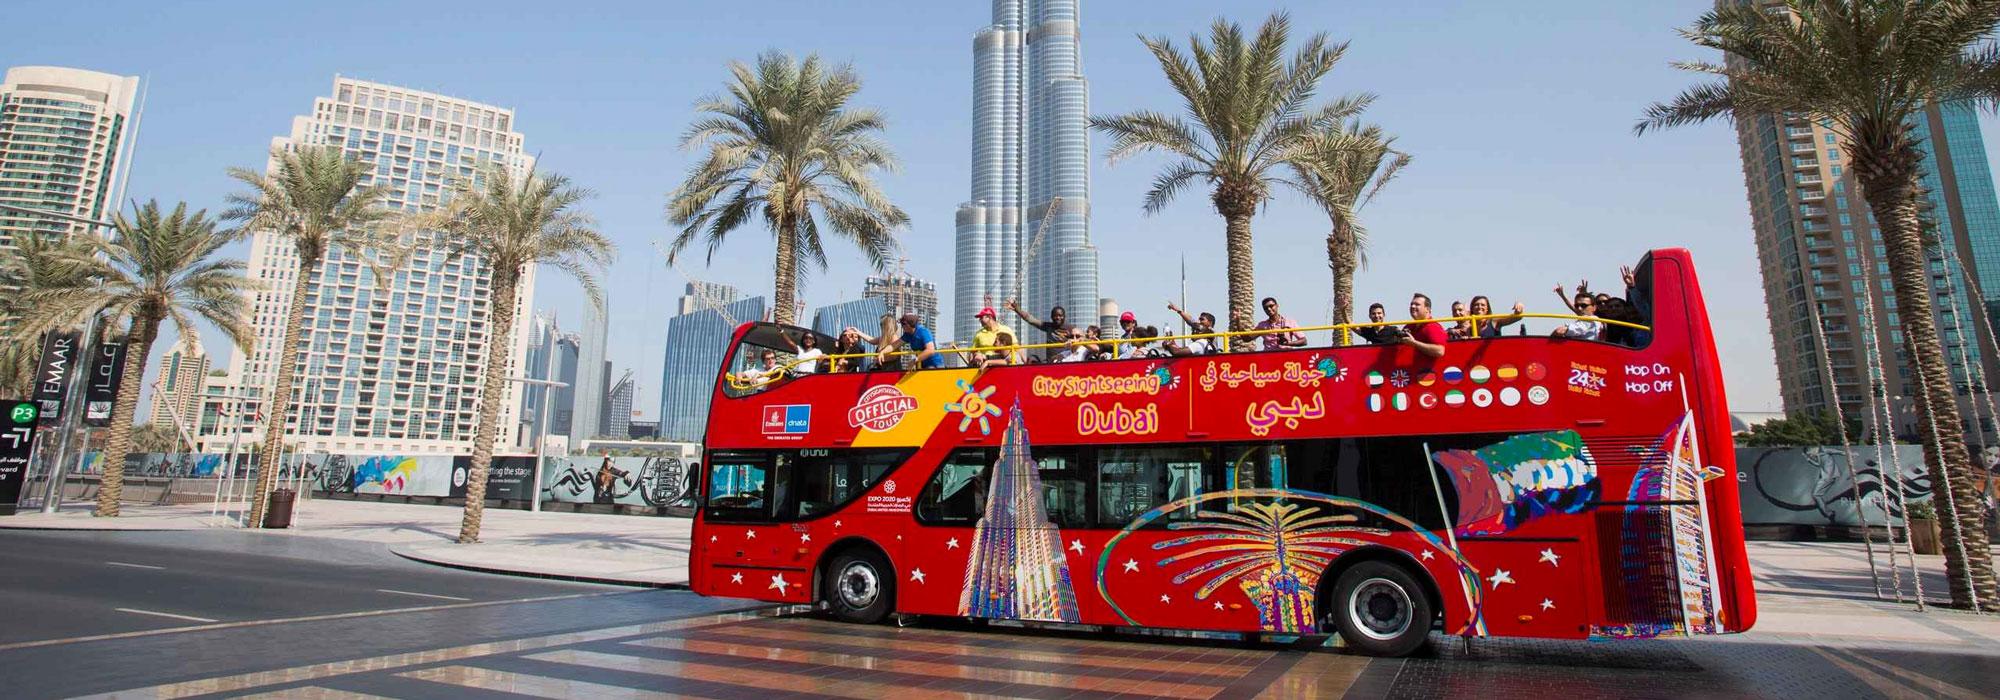 water bus service in Dubai